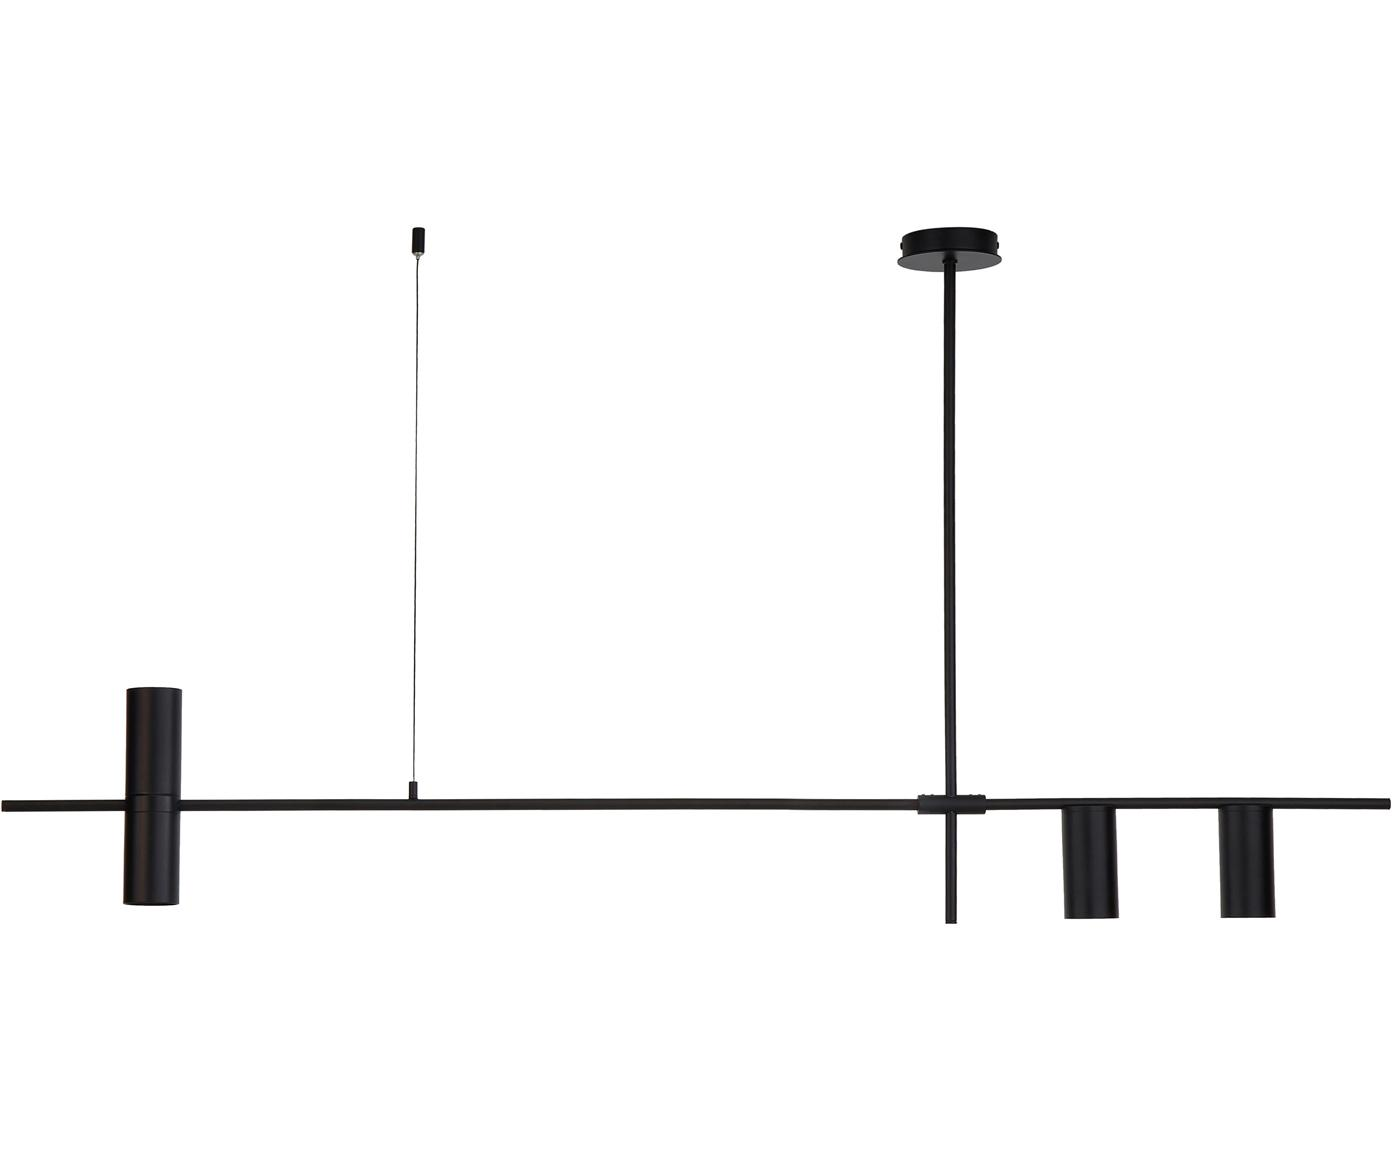 Pendelleuchte Cassandra, Metall, pulverbeschichtet, Schwarz, matt, Ø 6 x H 73 cm